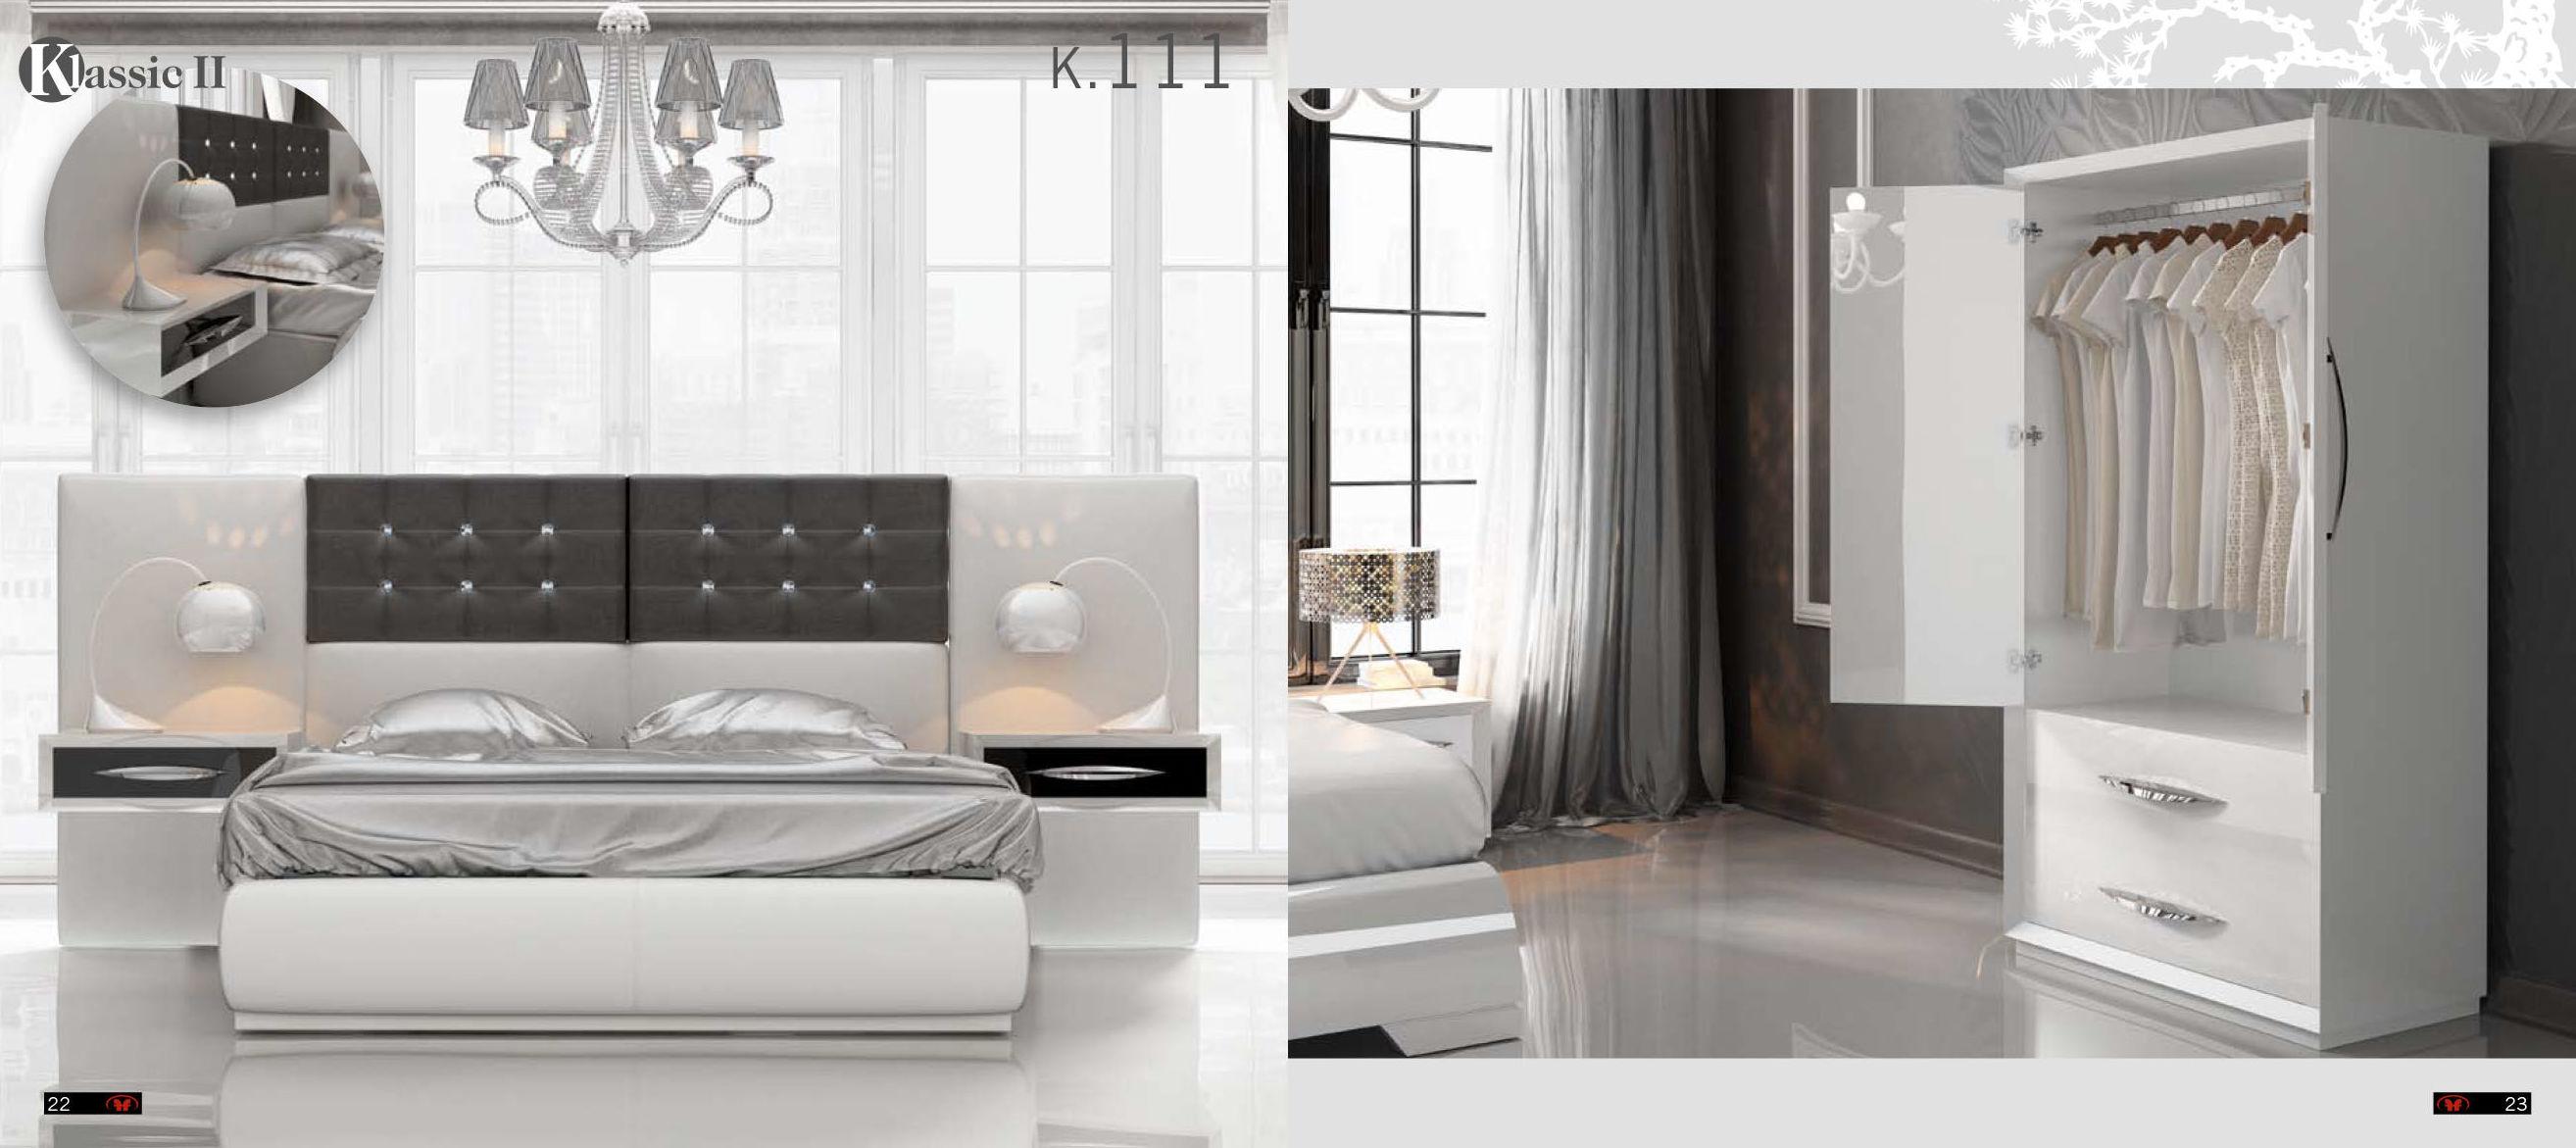 Franco Furniture Colecci N Klassic 2 Cat Logo De Muebles